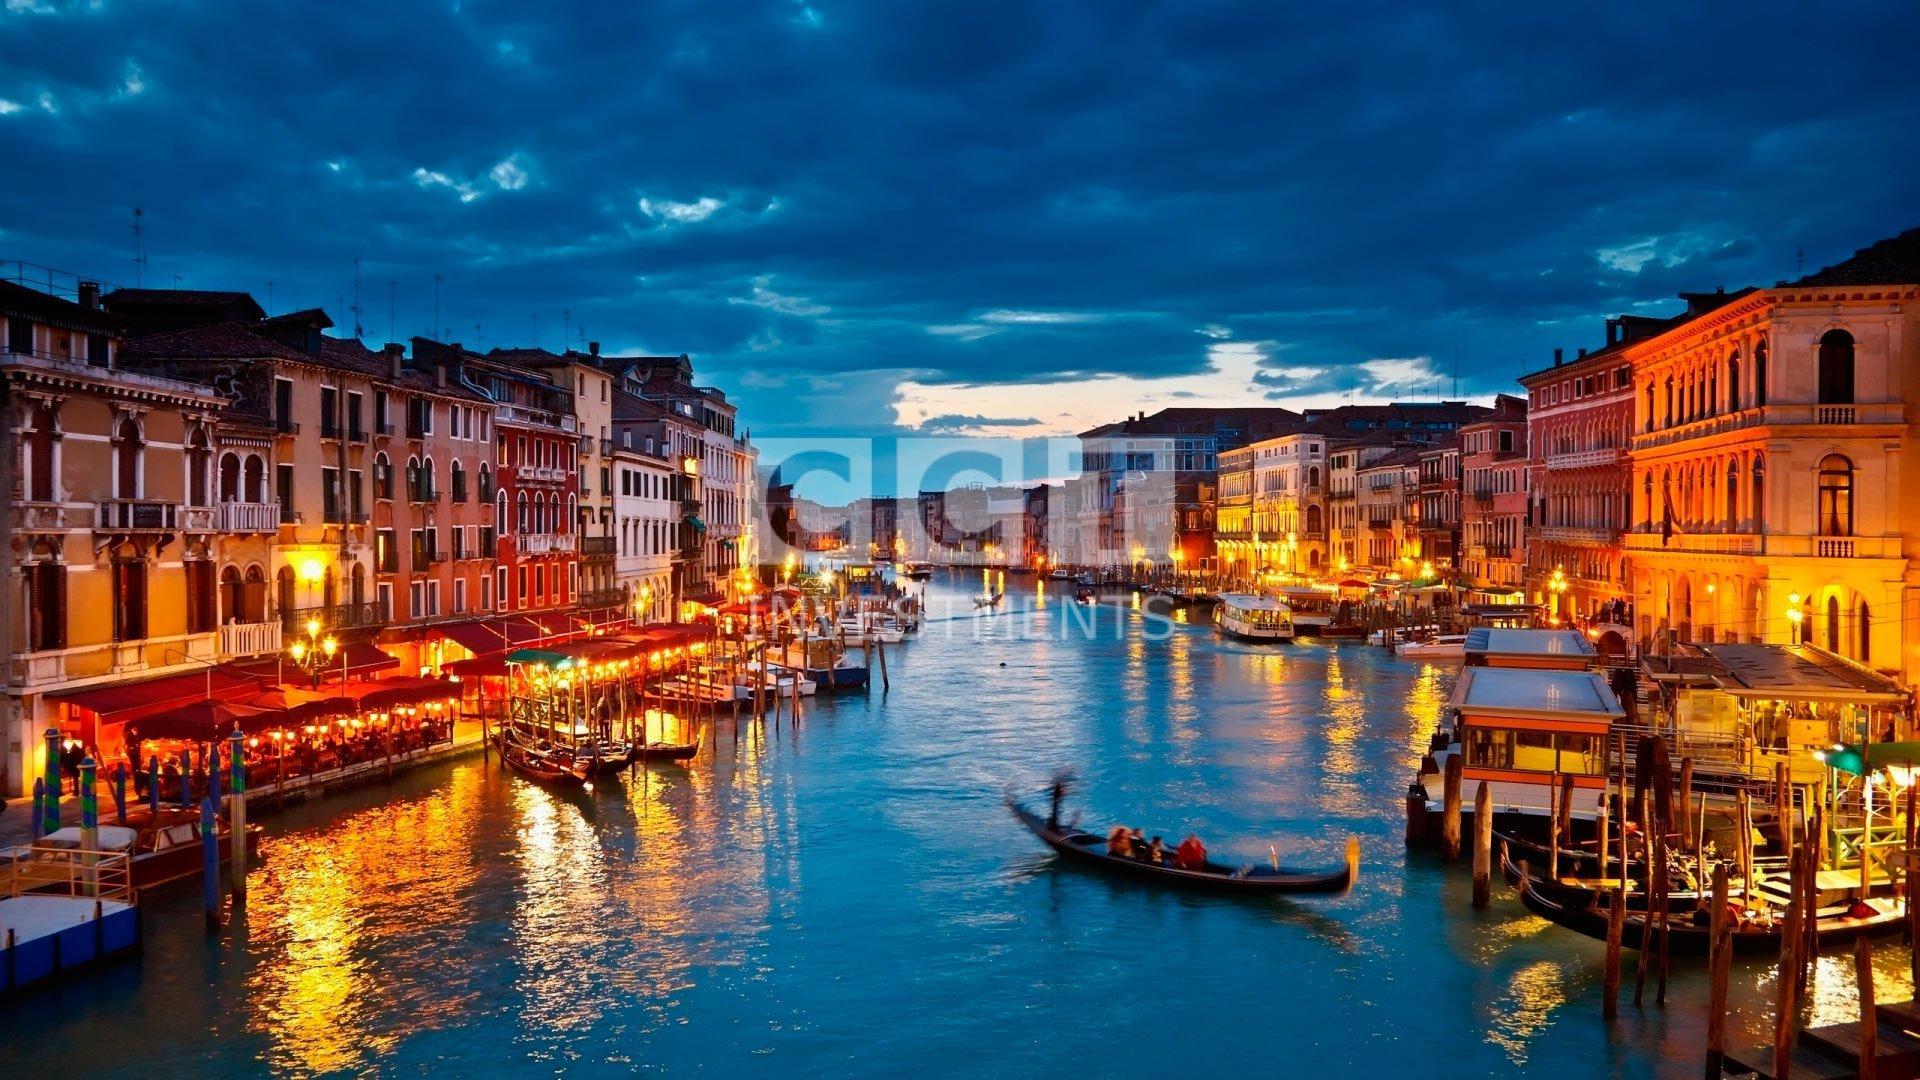 Venice city image